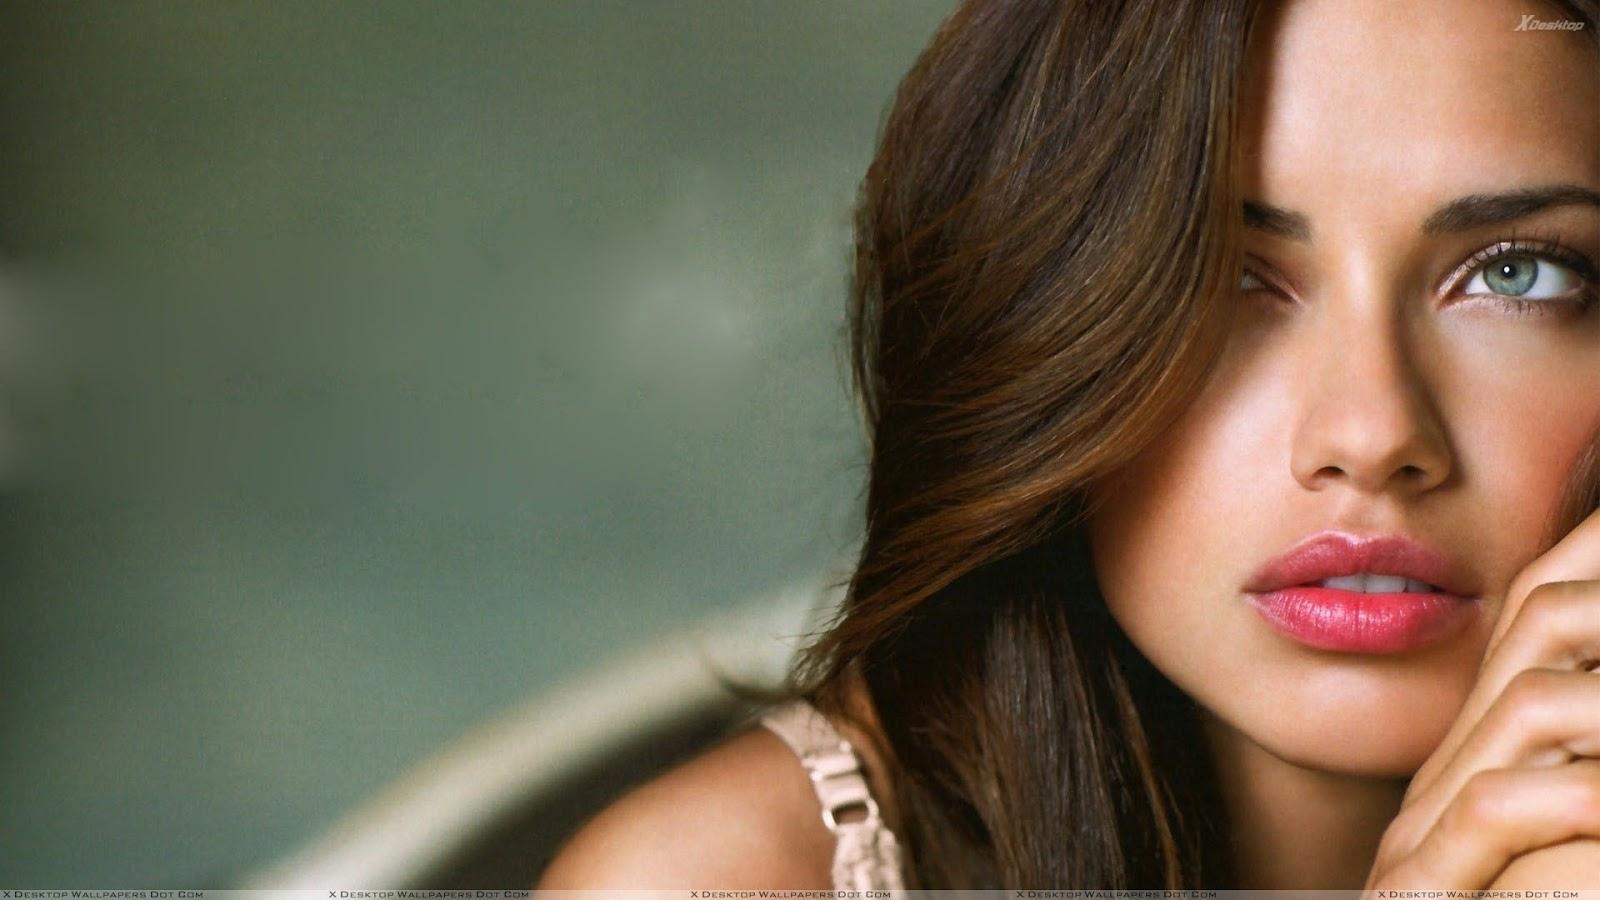 http://3.bp.blogspot.com/-30hDTpn6ssU/T2oV3hlpYKI/AAAAAAAABwk/WkntH28s-YA/s1600/Adriana-Lima-Pink-Lips-And-Blue-Eyes-Face-Closeup.jpg